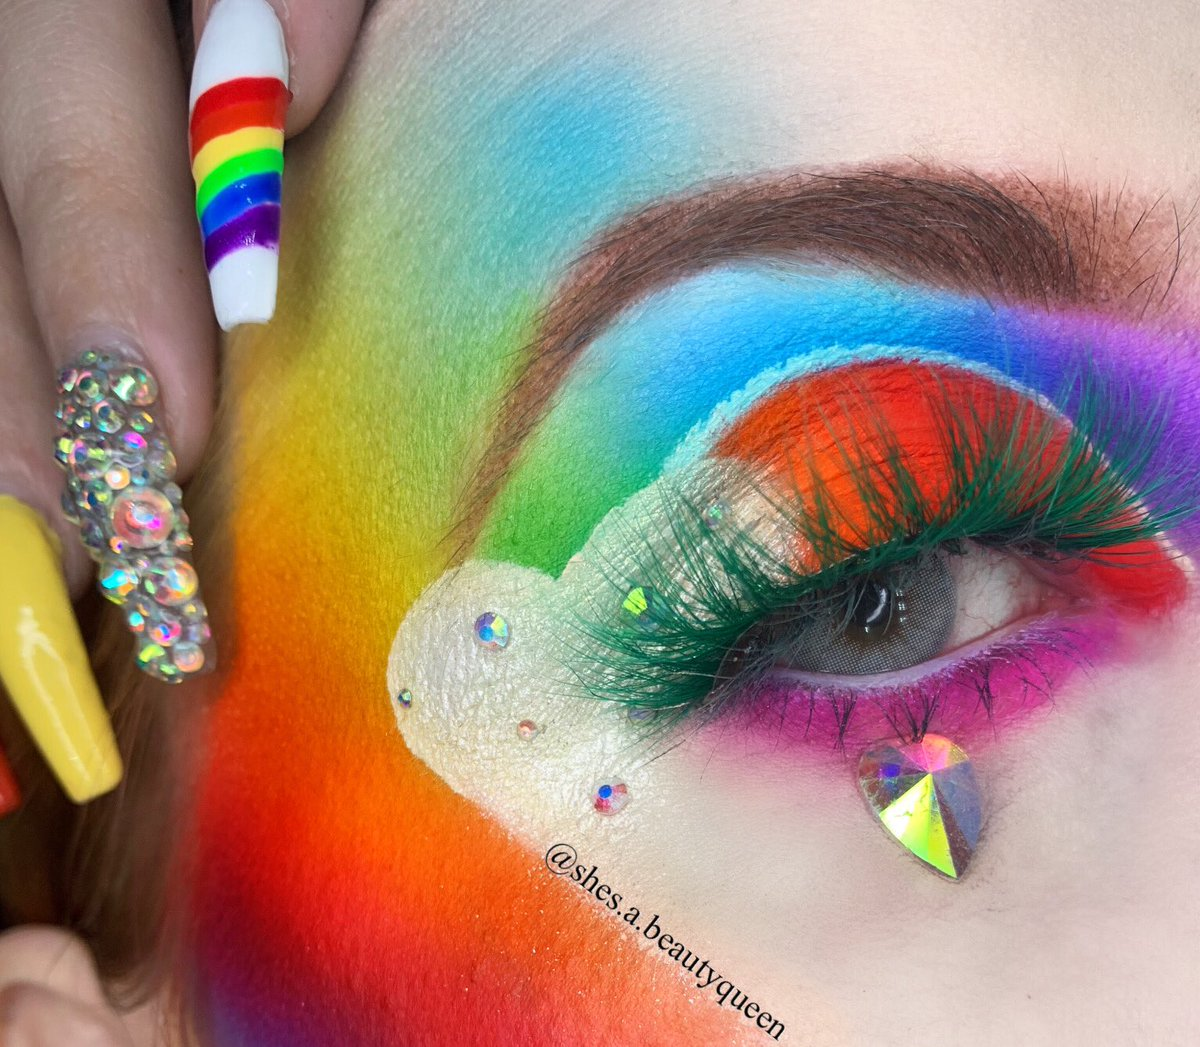 "Hearts  and rainbows   Lashes- @RoyalBeautyCos1 ""Fiona"" Palettes- @norvina @anastasiabeverlyhills ""vol 3""  @jeffreestar @jeffreestarcosmetics ""jawbreaker""  Brows- @morphebrushes ""latte brow cream"" Inspo from @the_beauty.junkie  #morphe #anastasiabeverlyhills #LGBTQpic.twitter.com/mXClbZHz5z"